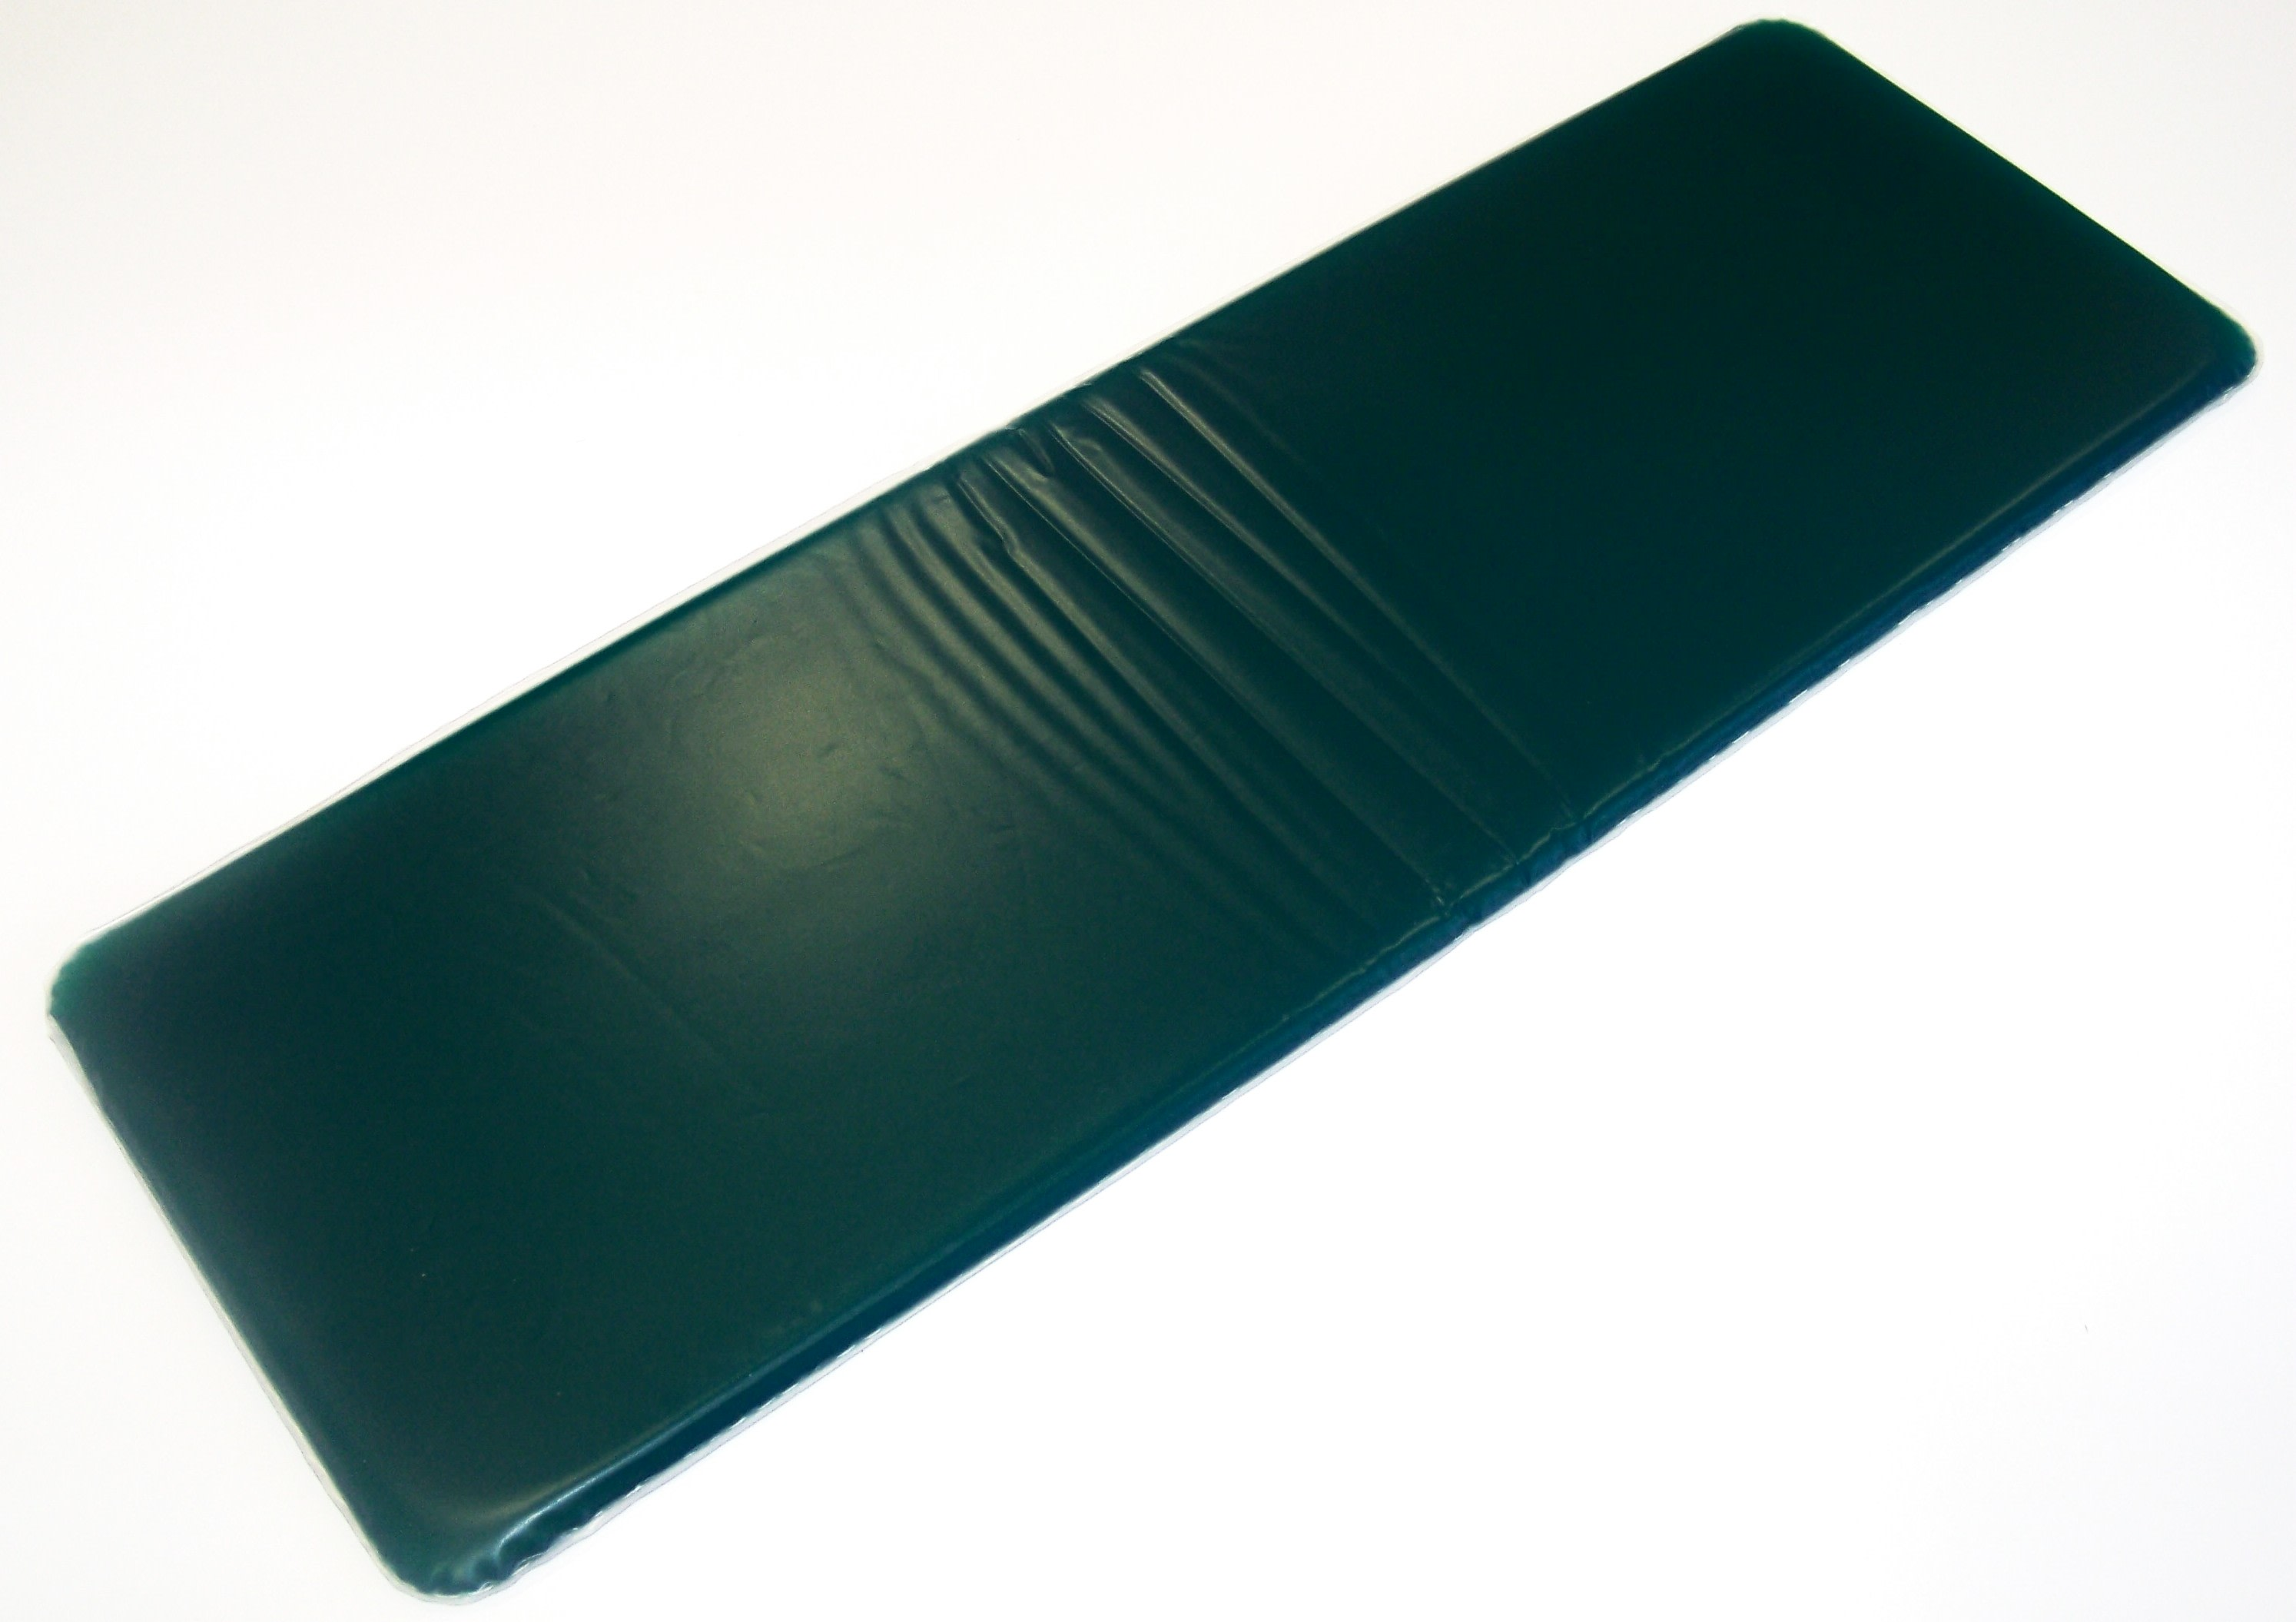 Oasis Armboard Pad (OA071) - Infant / Adolescent / Adult - 600 x 200 x 10mm